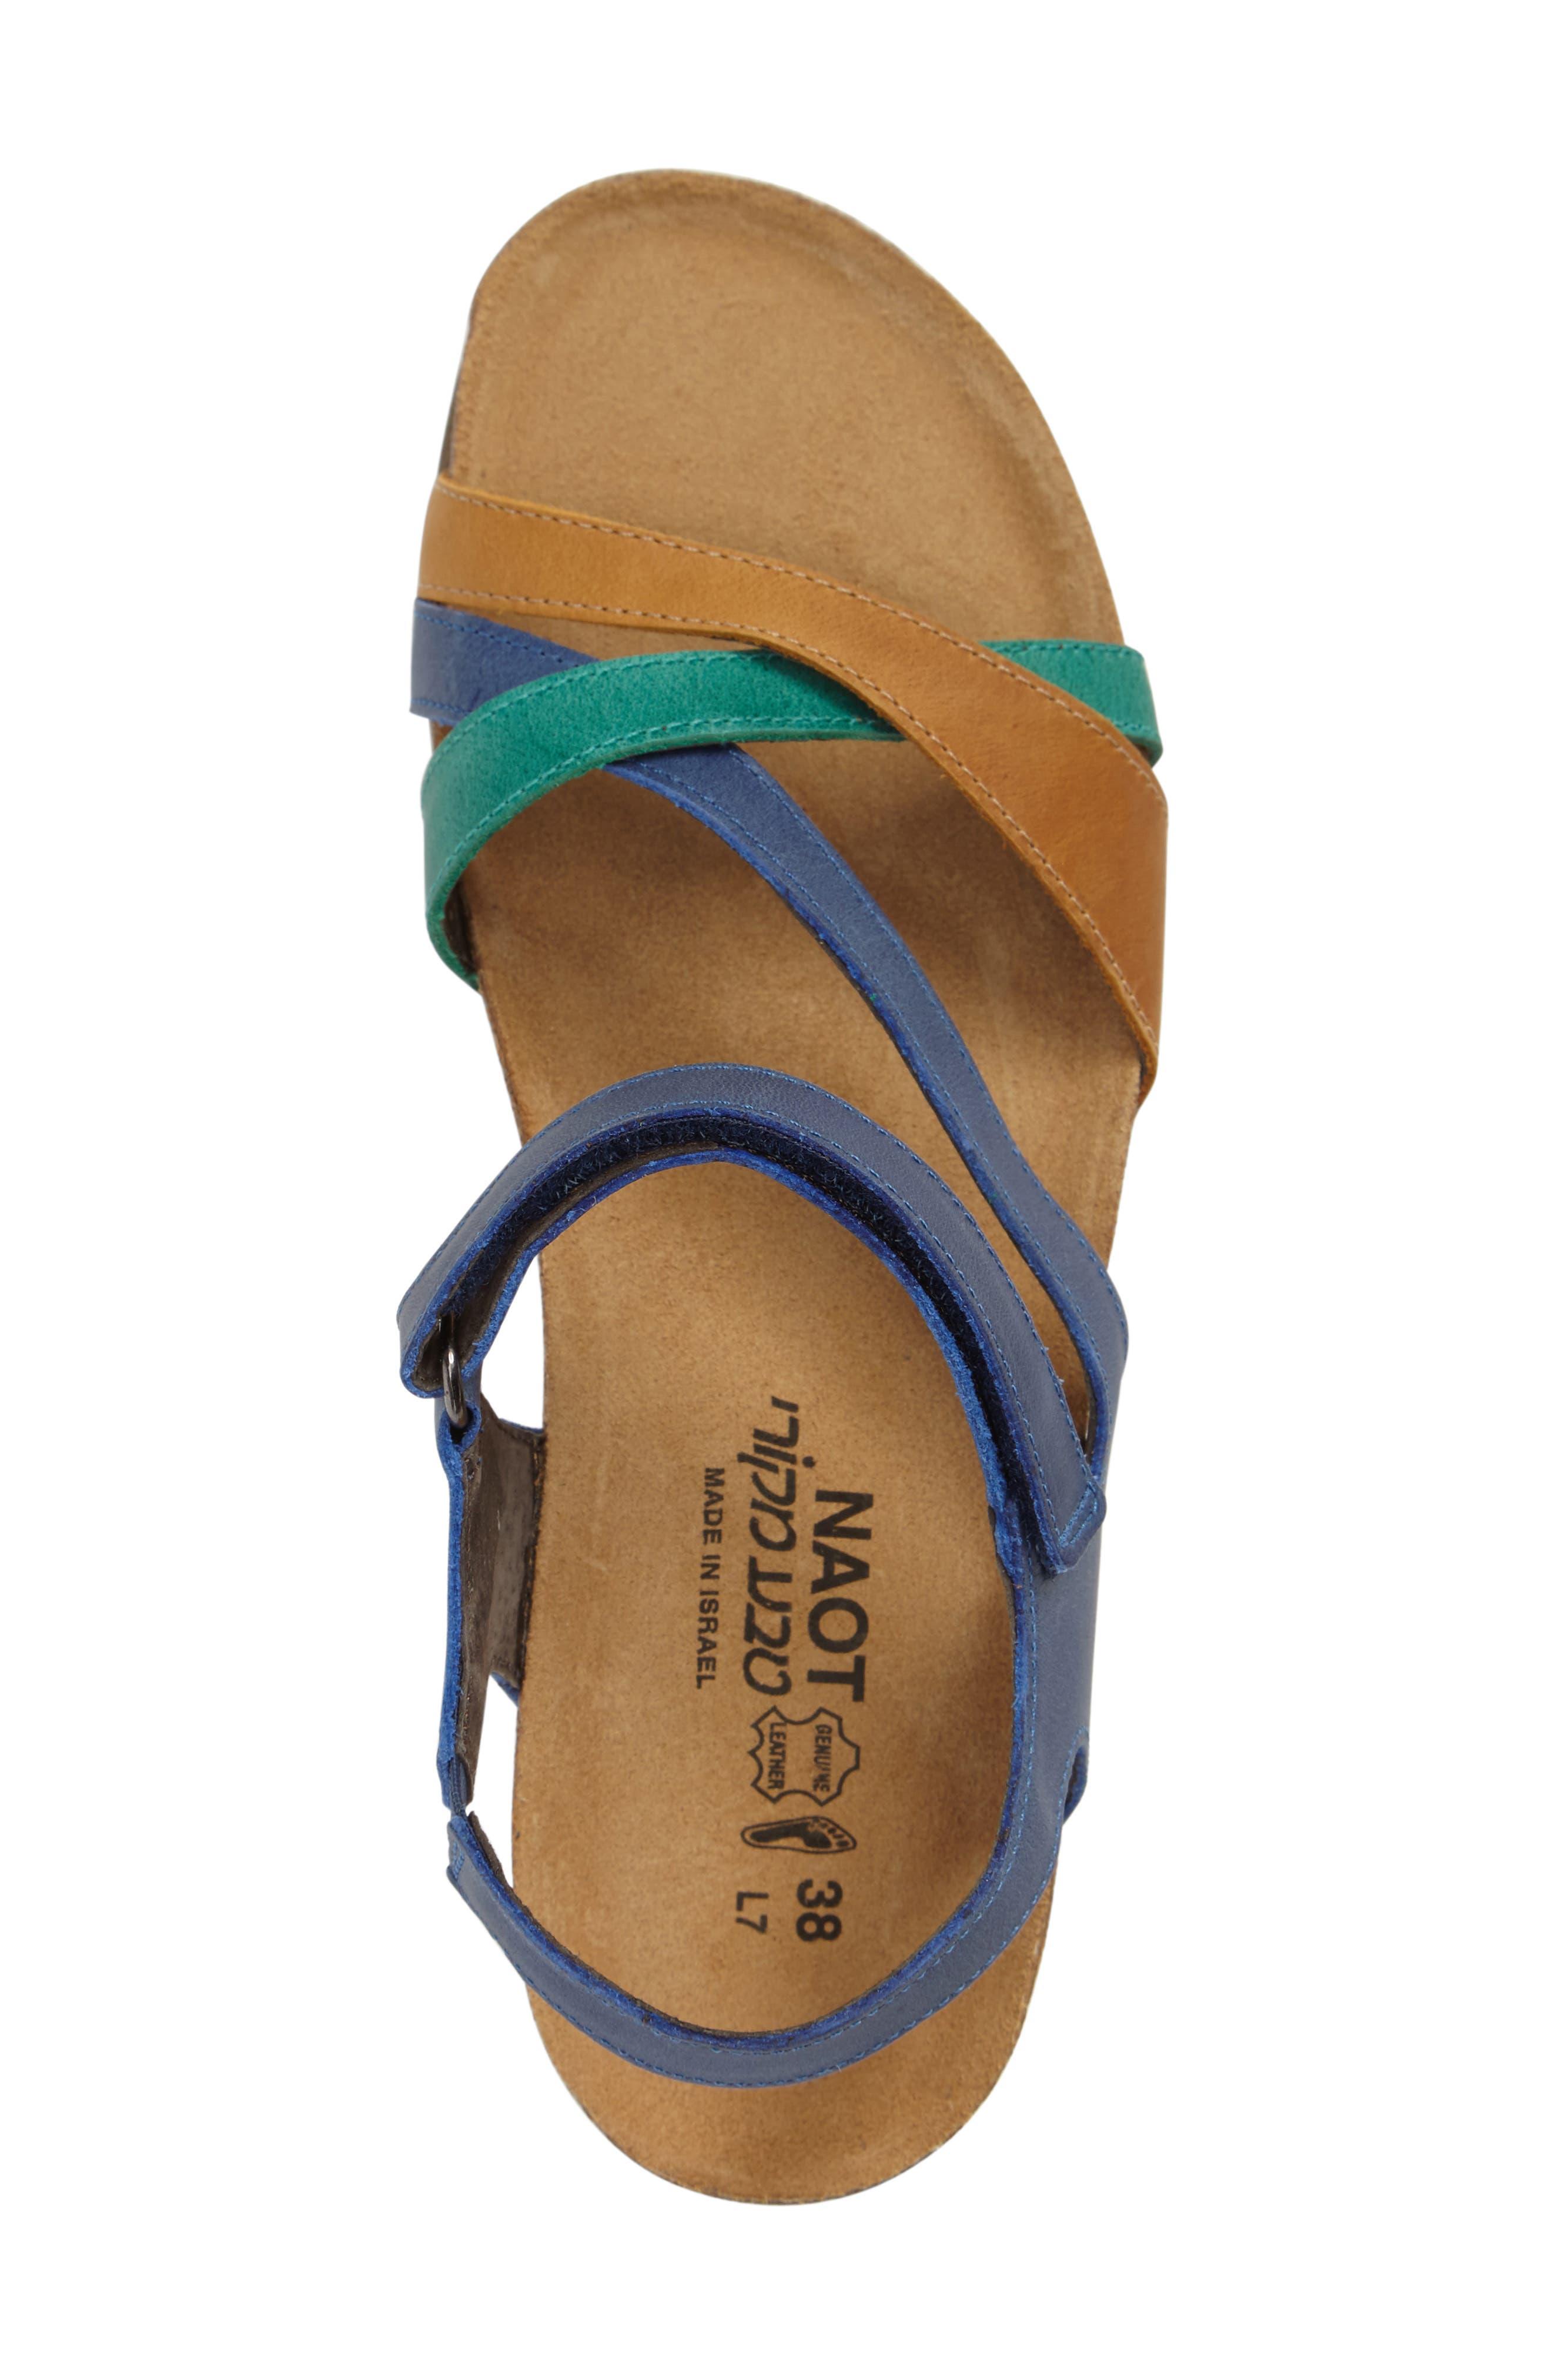 'Sophia' Sandal,                             Alternate thumbnail 3, color,                             Blue/ Brown Nubuck Leather